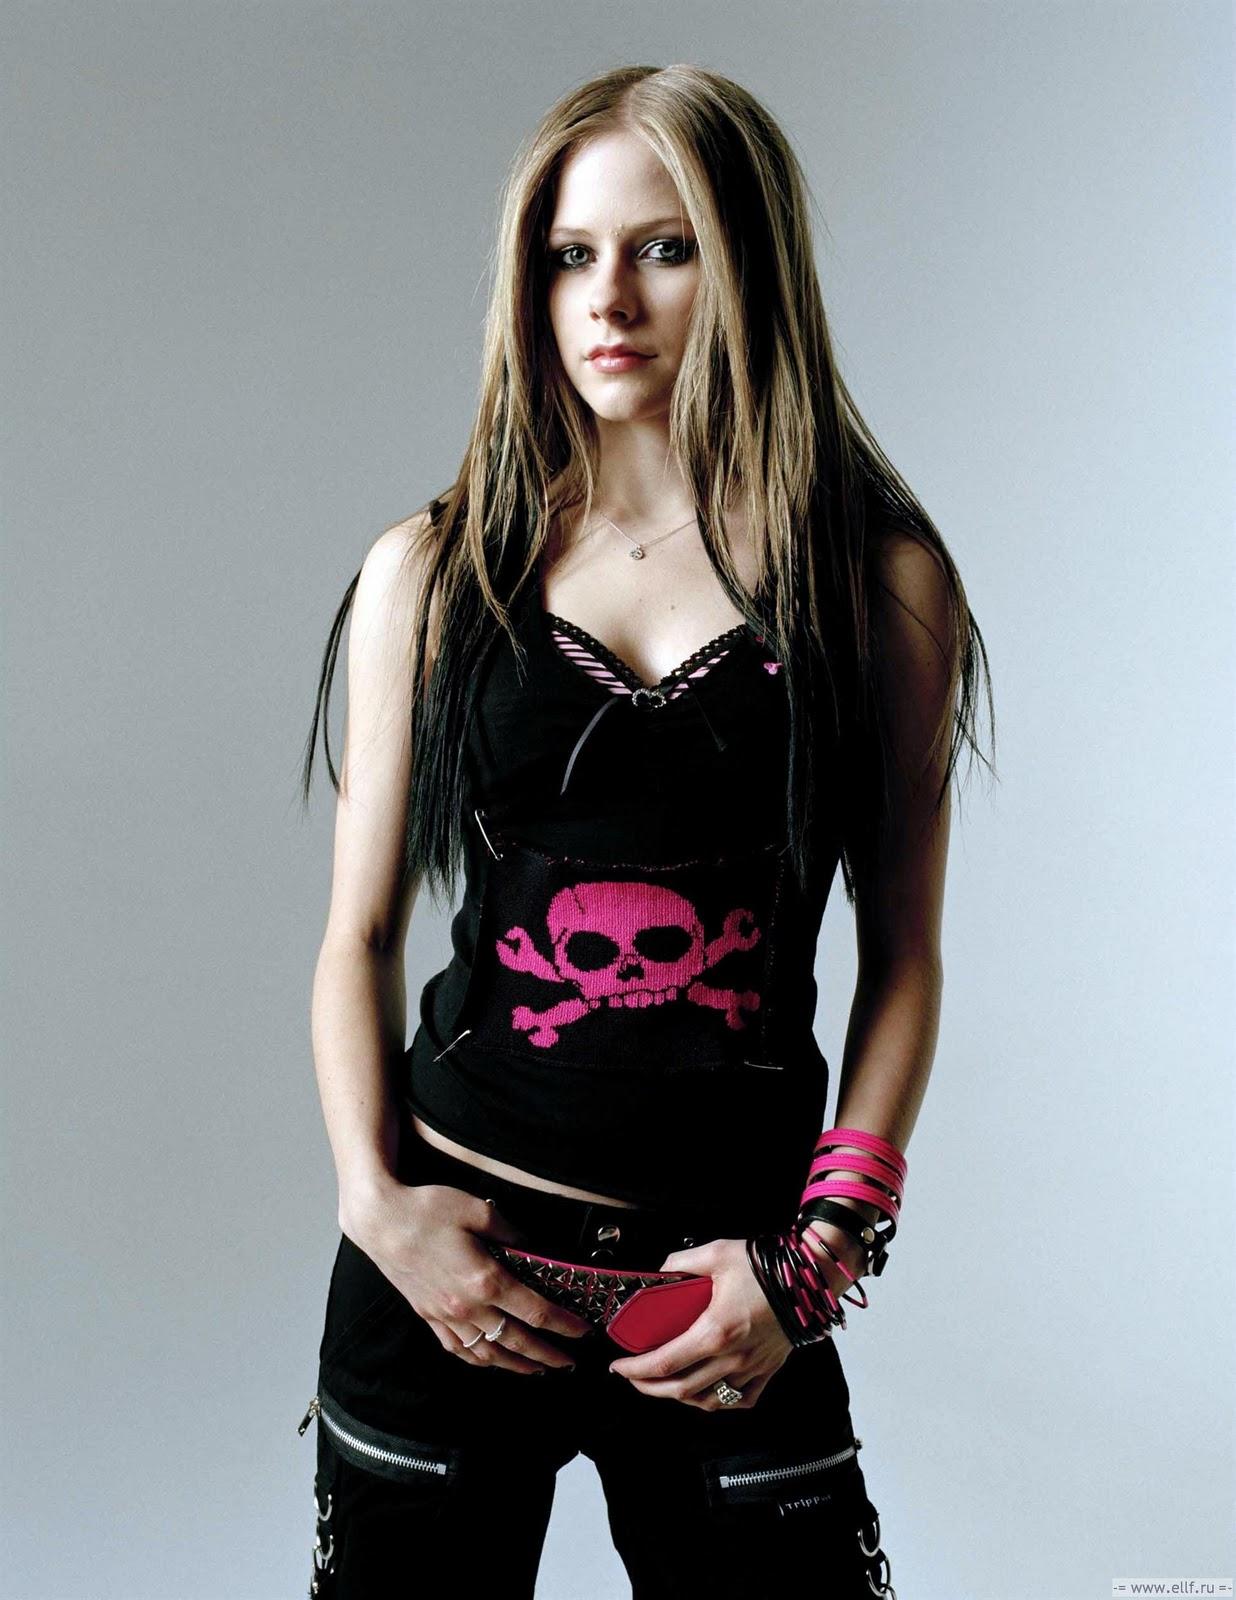 http://4.bp.blogspot.com/_Ti-K8J59JSE/TT8HdTIlFFI/AAAAAAAAAQ8/PryZK86Xdss/s1600/Avril_Lavigne_29.jpg